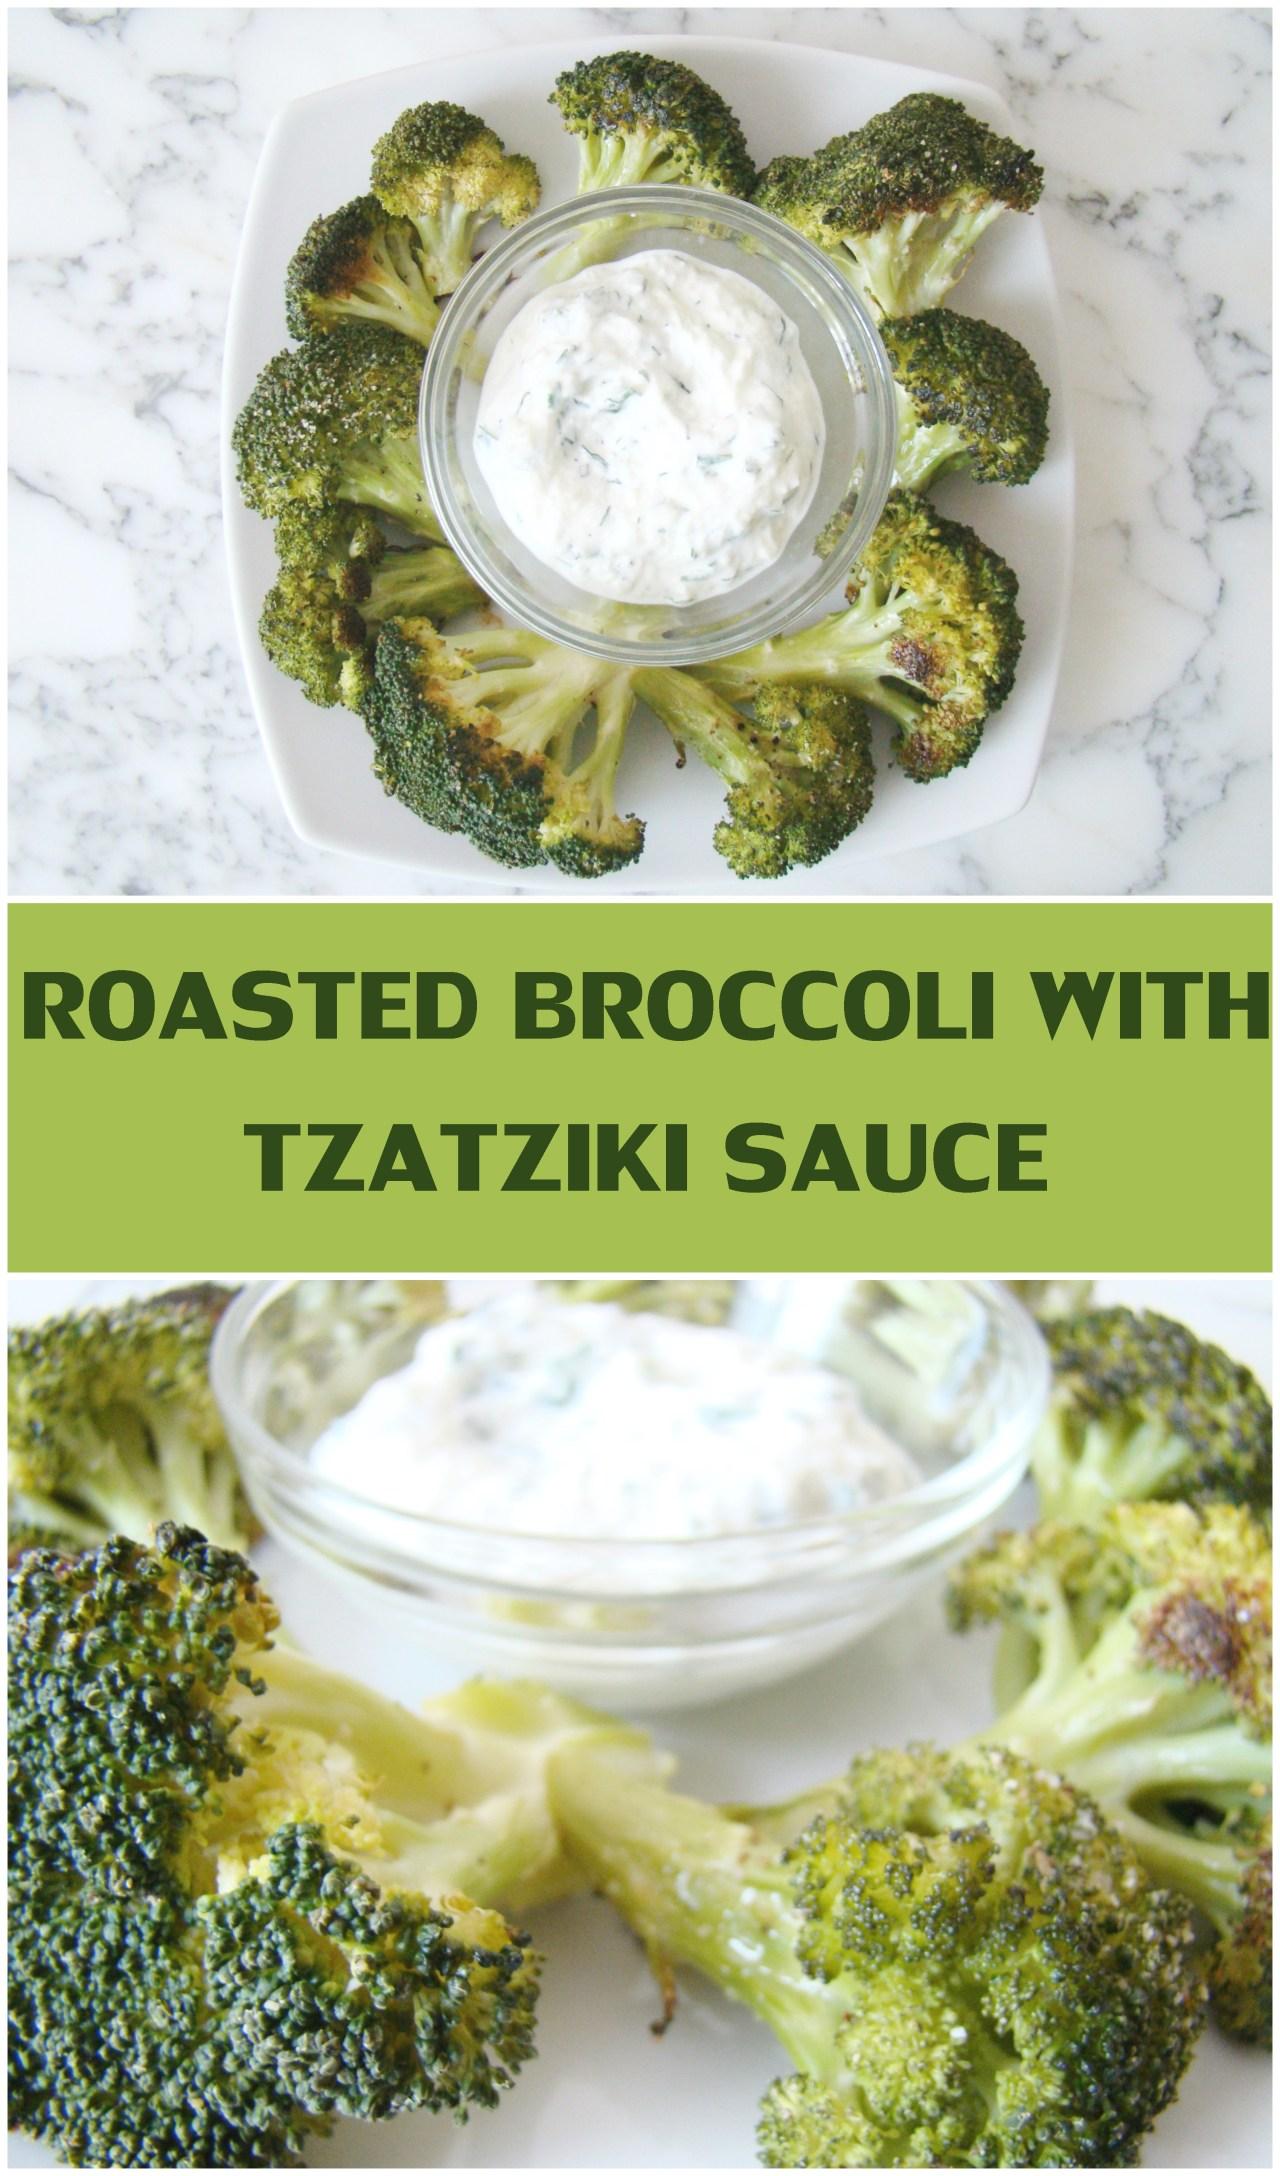 Roasted Broccoli with Tzatziki Sauce